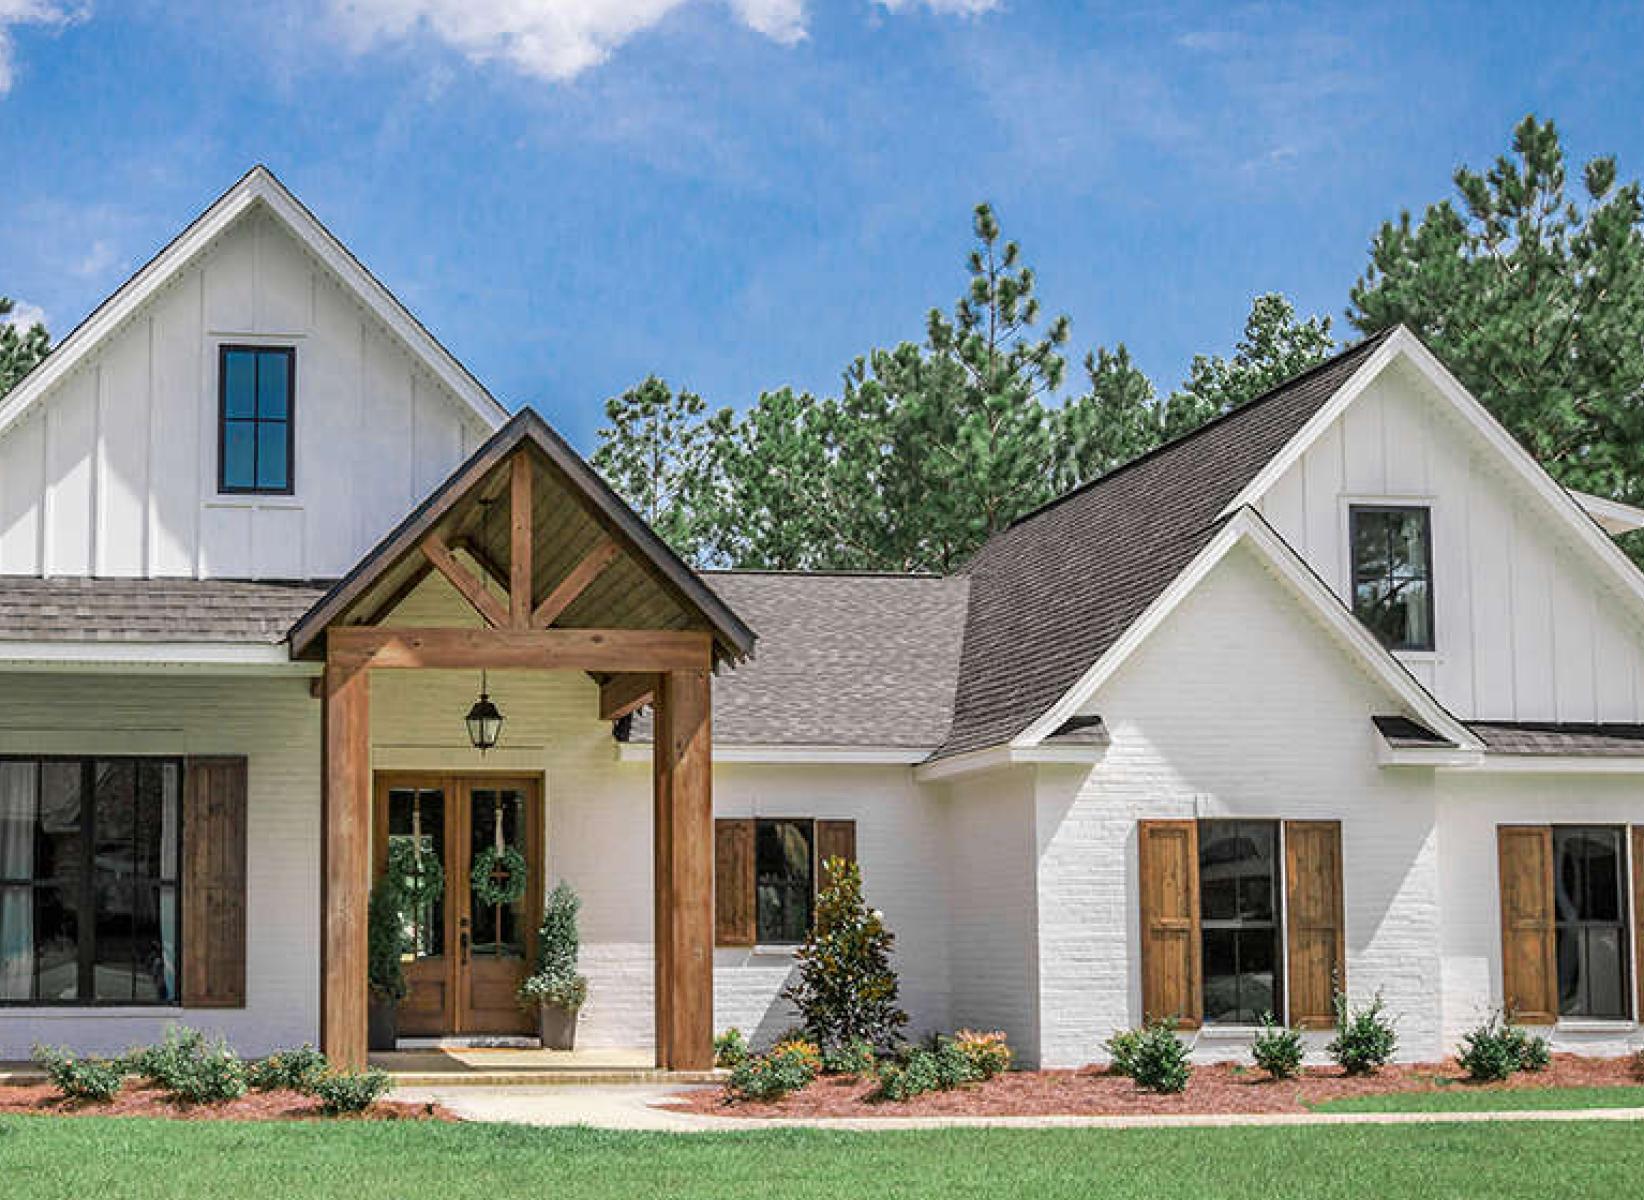 Real estate listing in Charlotte, North Carolina